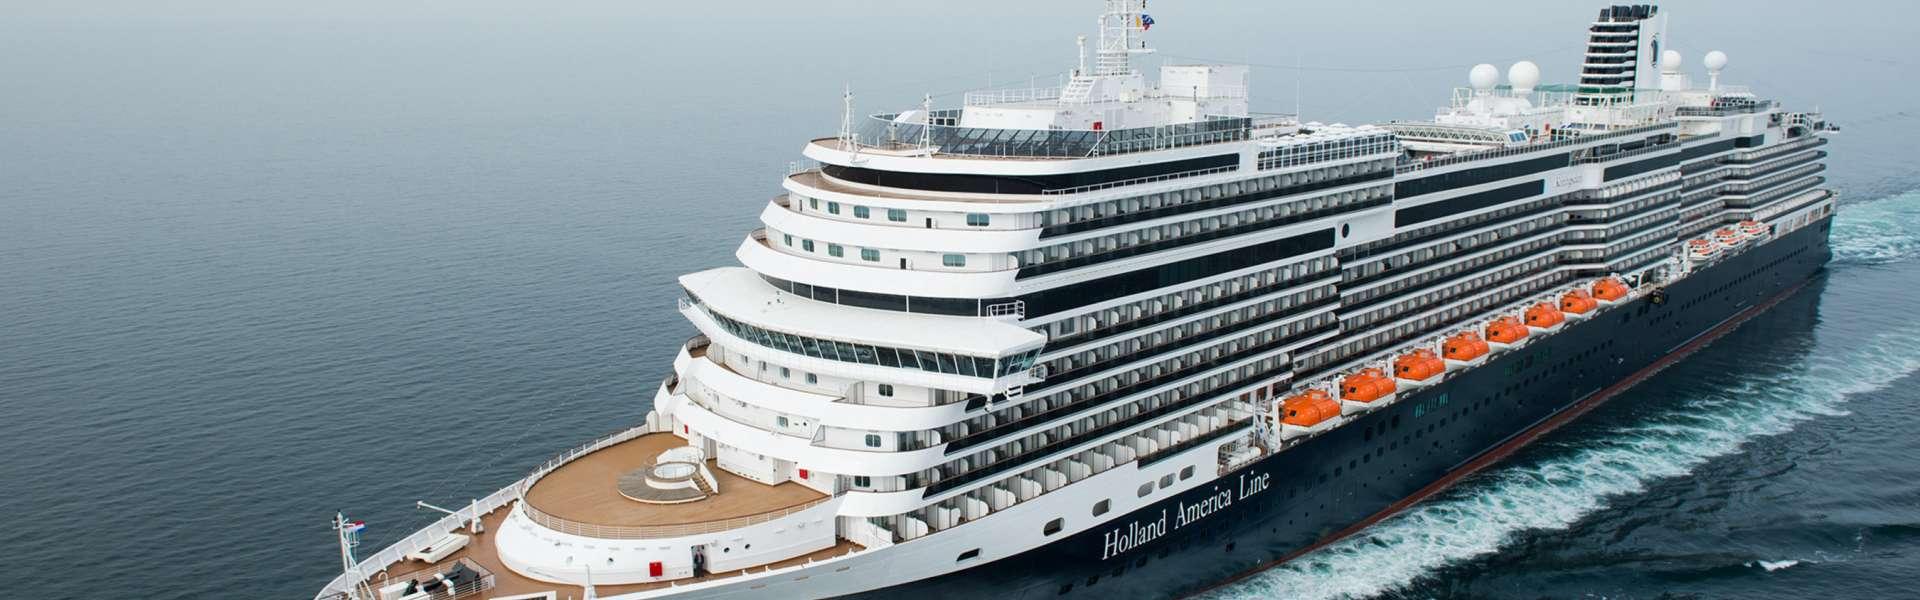 Croaziera 2019 - Caraibe de Est (Fort Lauderdale) - Holland America Line - ms Koningsdam - 11 nopti